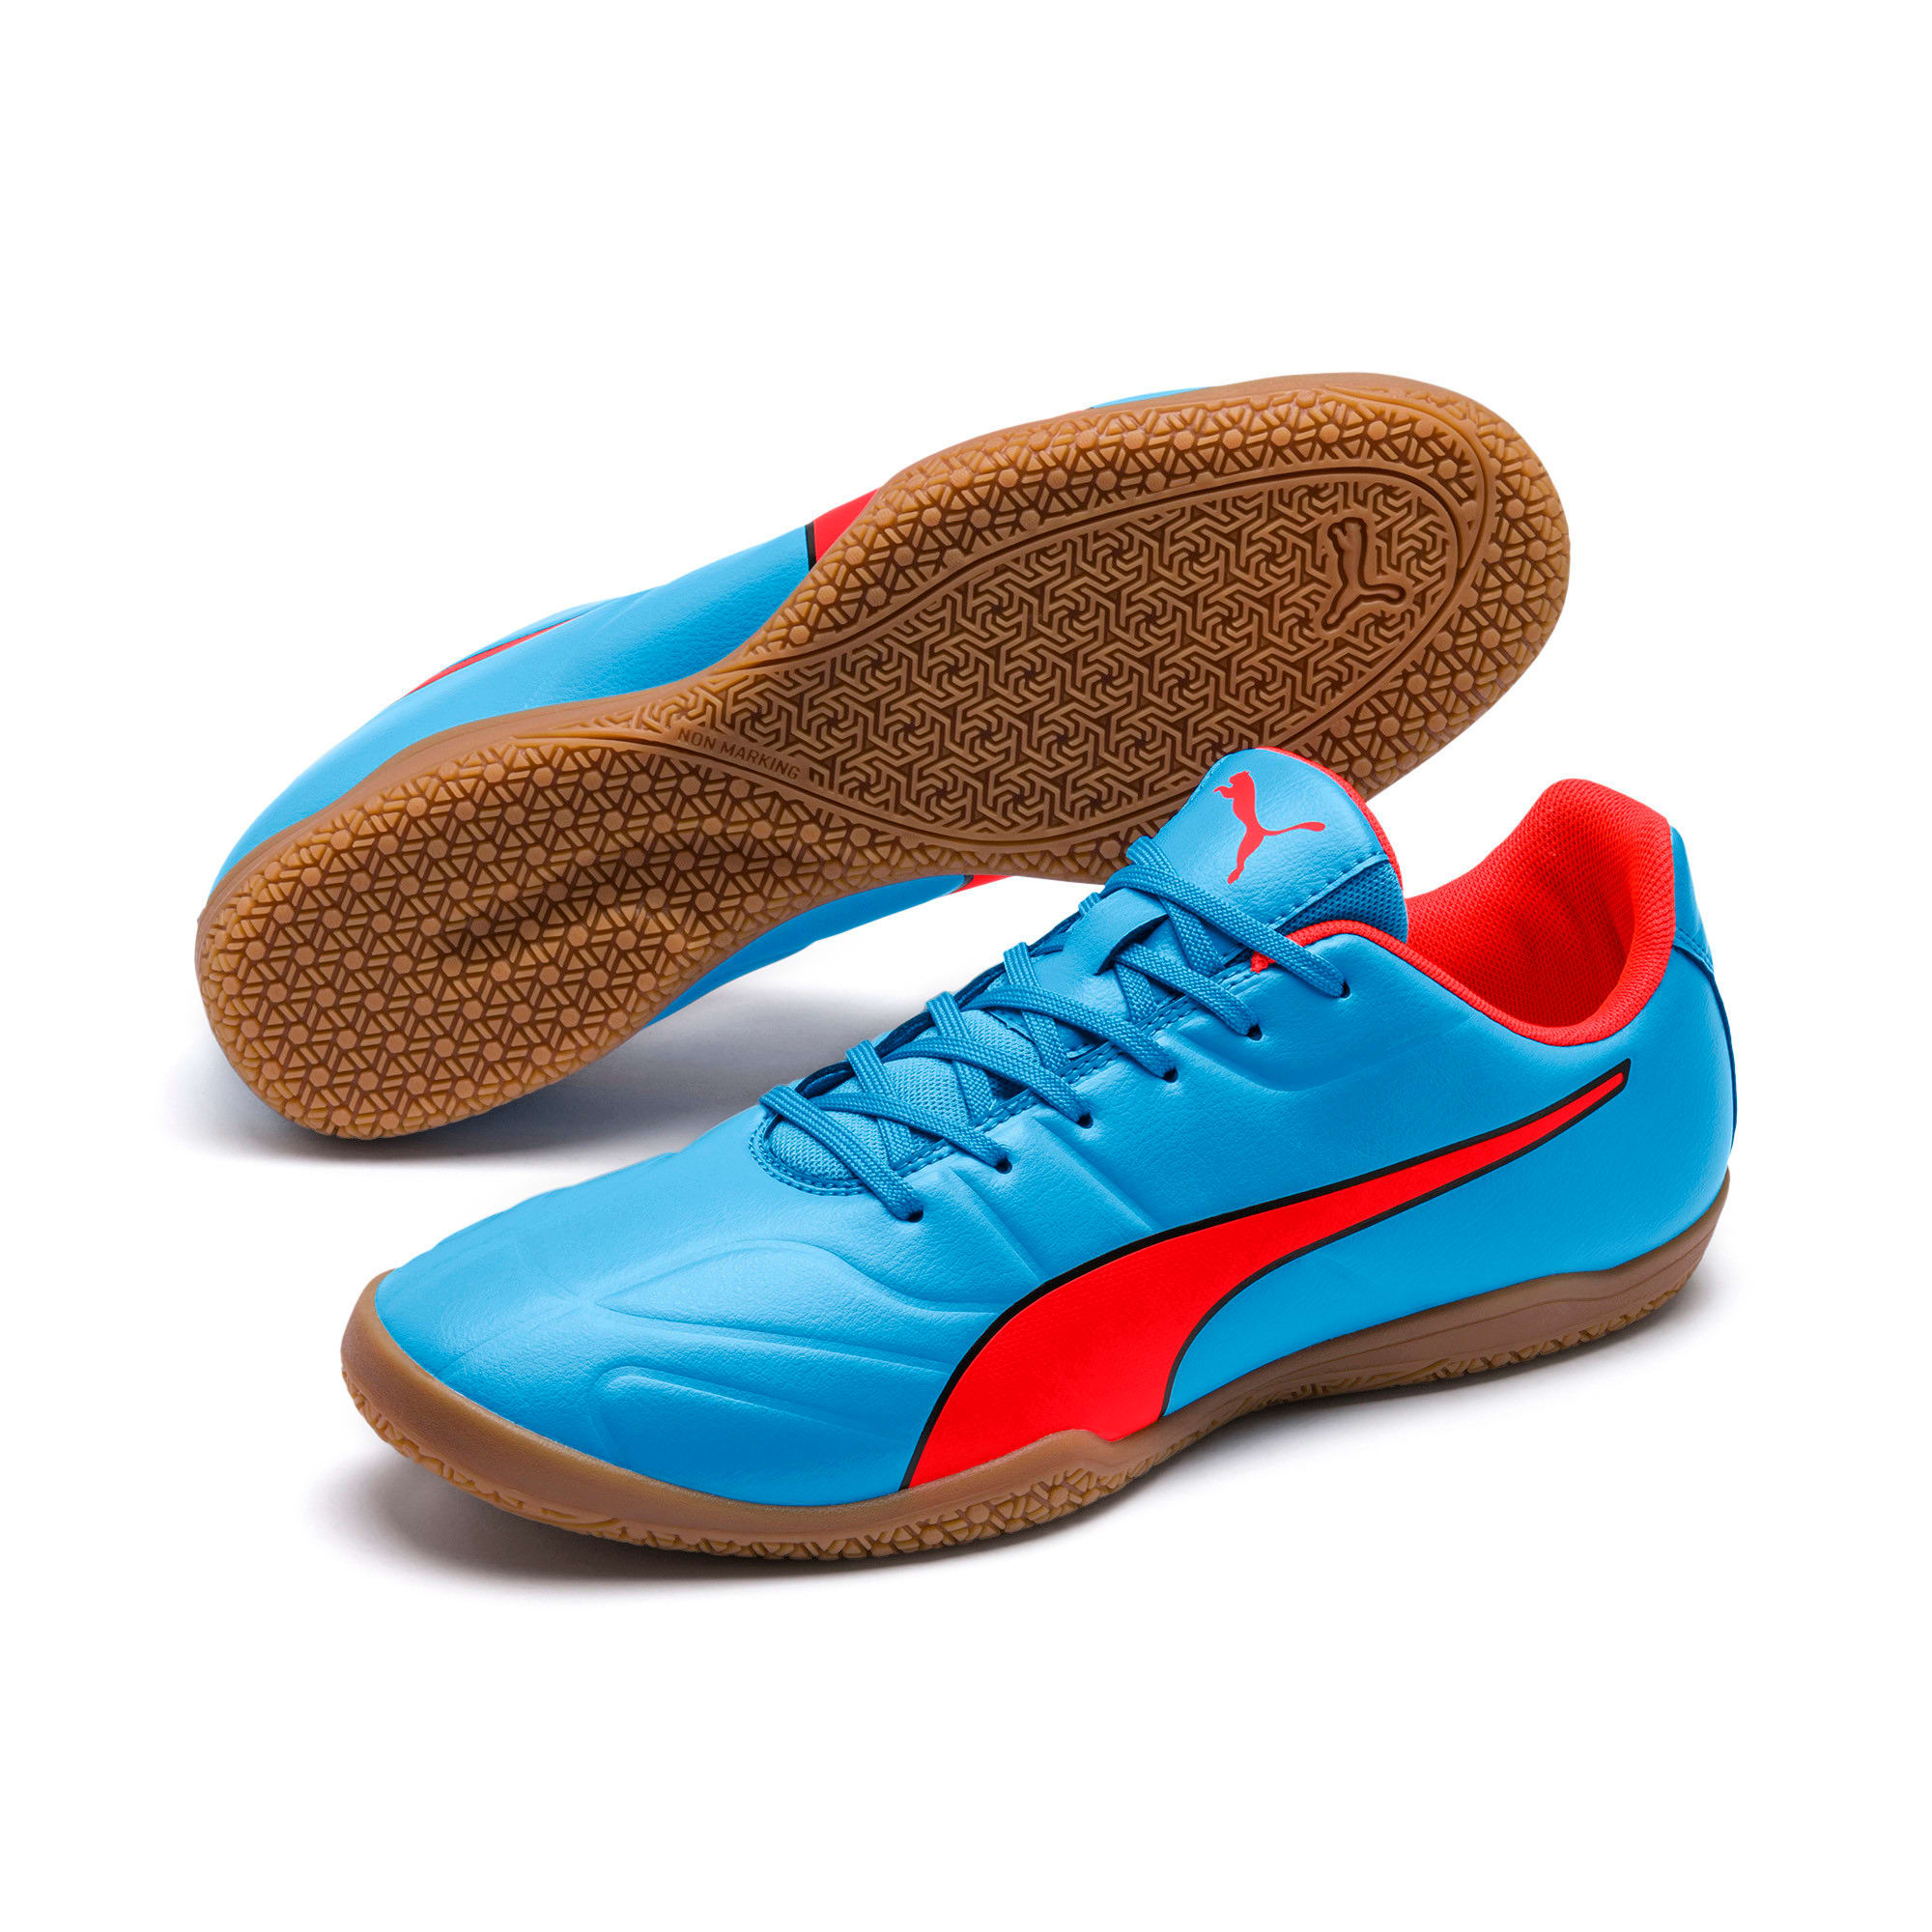 Thumbnail 6 of Classico C II Sala Men's Football Boots, Bleu Azur-Red Blast-Black, medium-IND